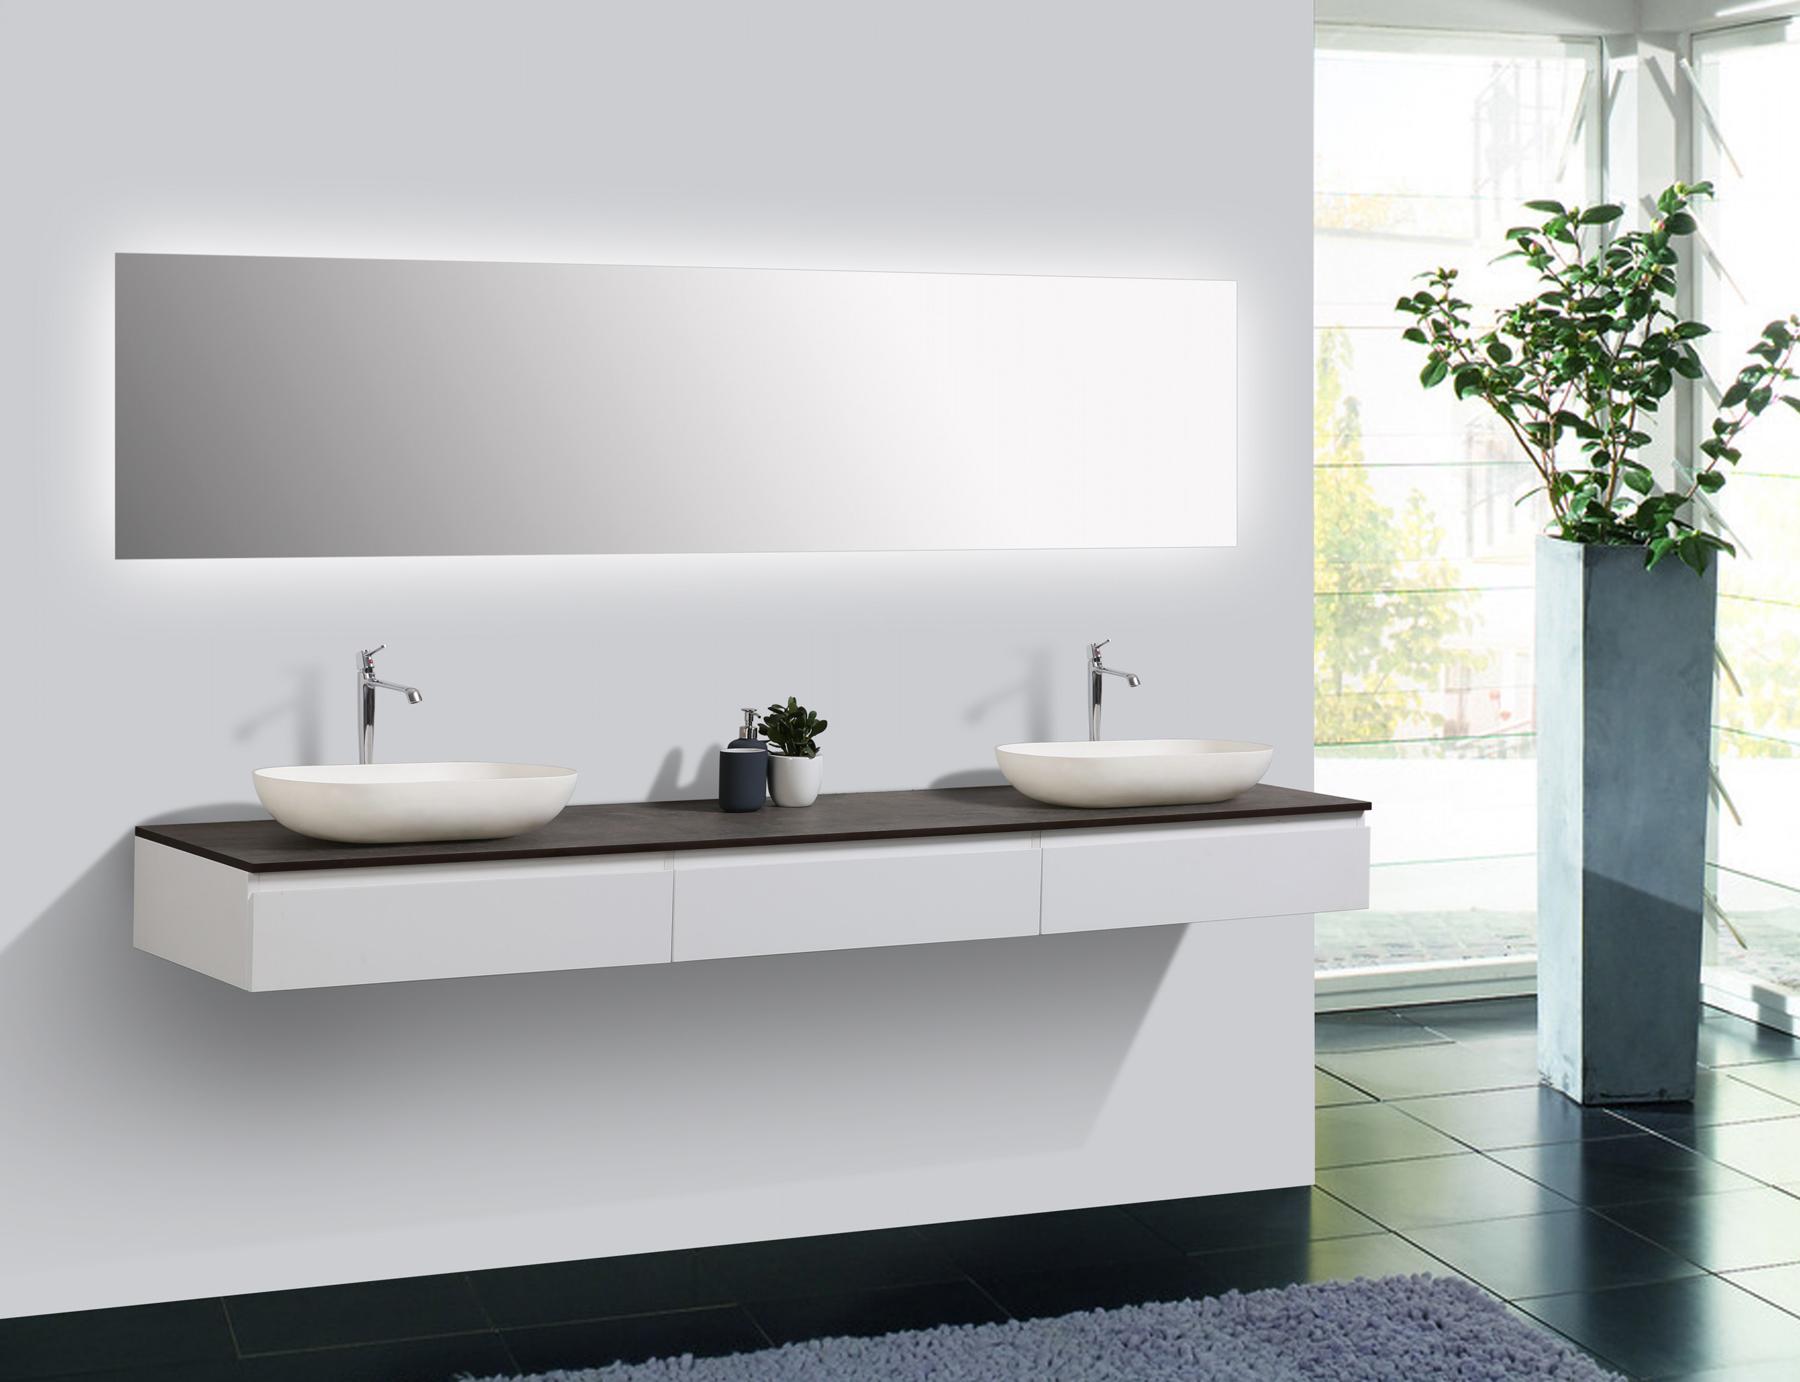 Mobili da bagno vision bianco opaco bacino opzionale ebay